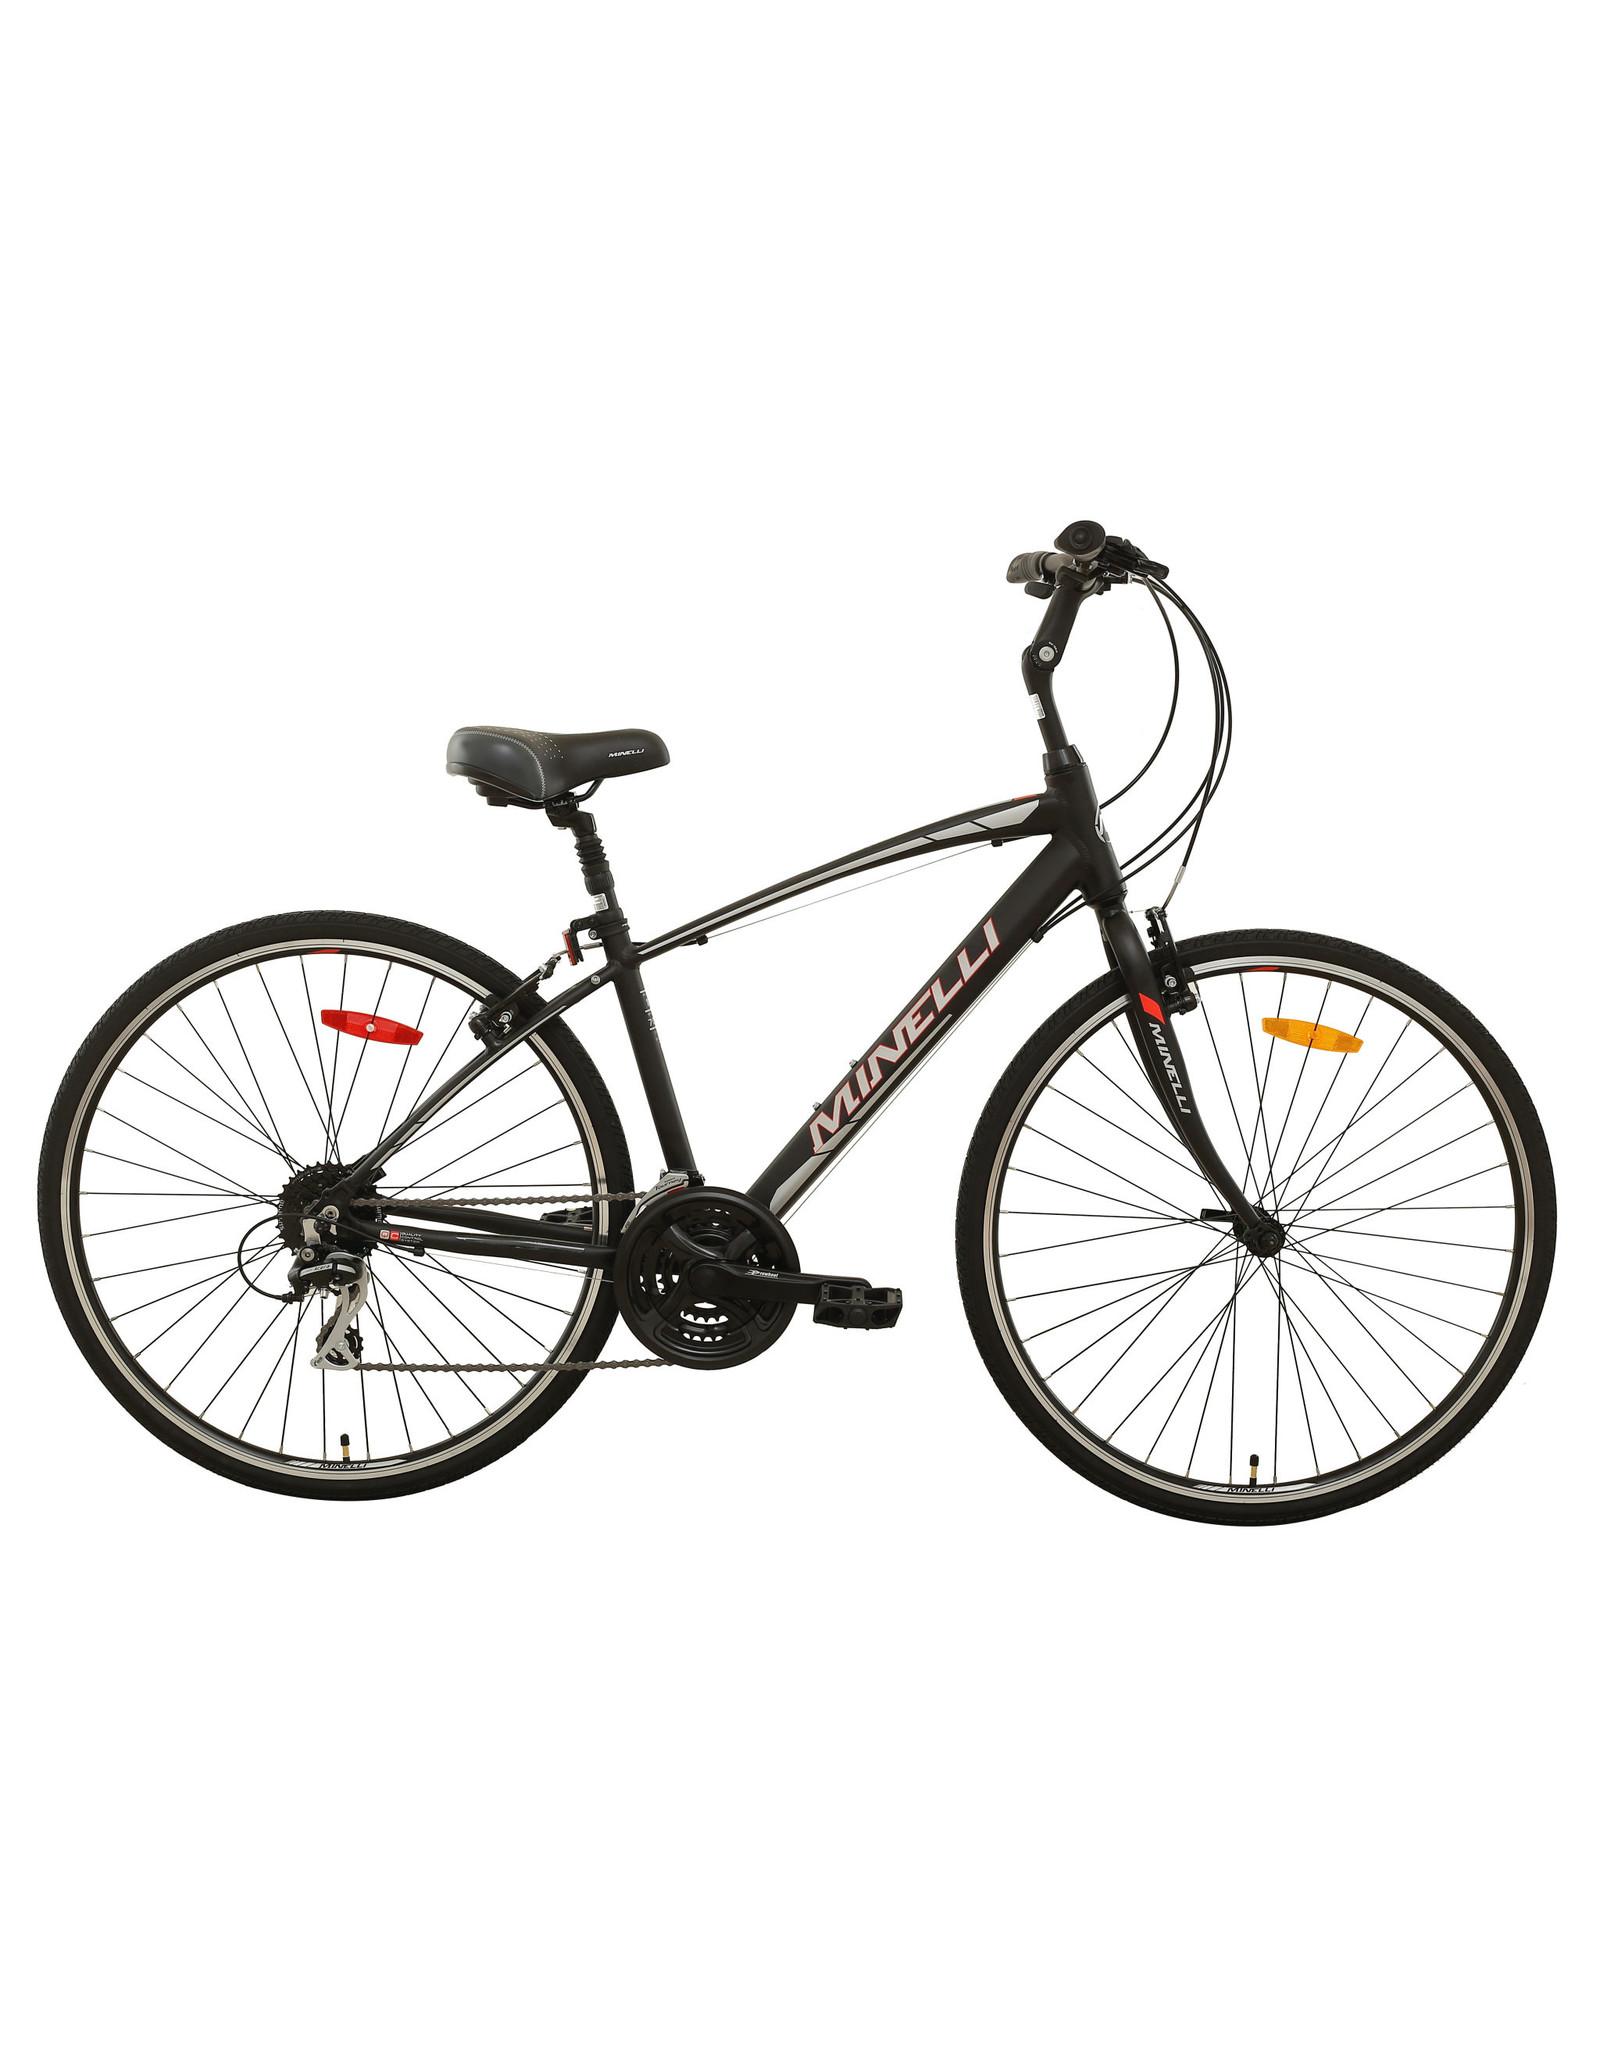 Minelli Vélo Hybride - MINELLI Promenade Homme